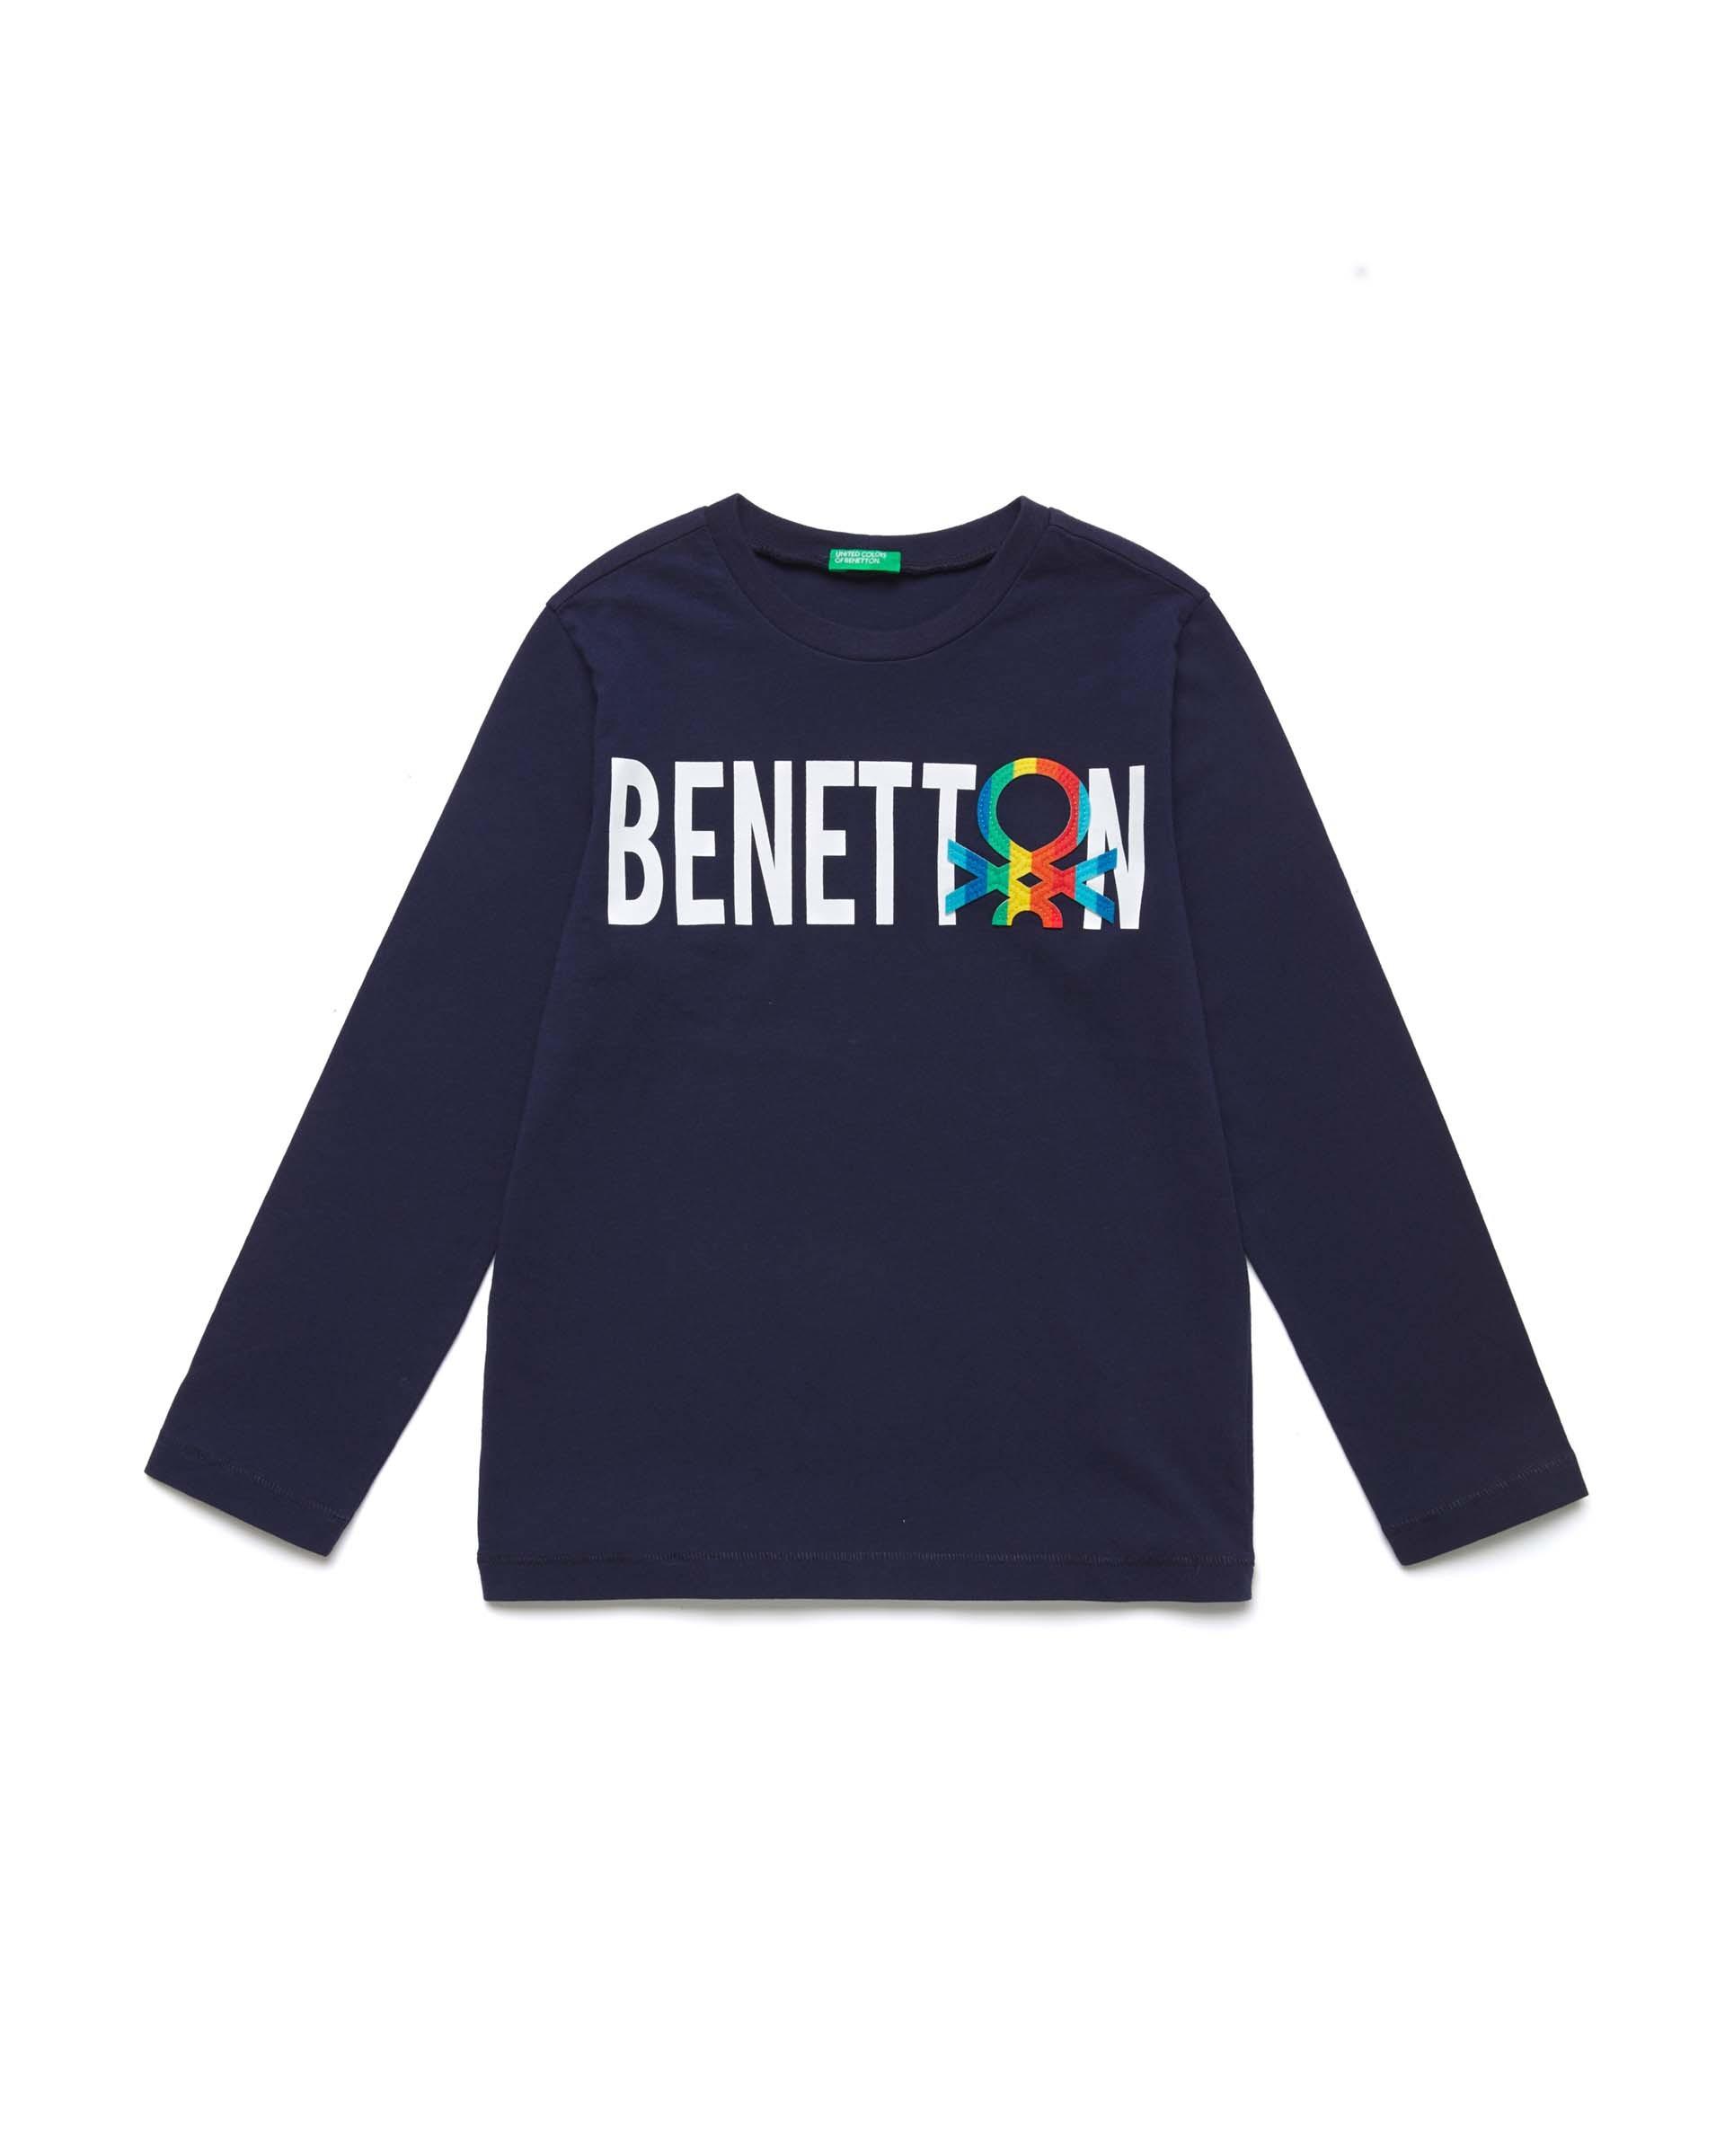 20P_3096C14JI_252, Футболка для мальчиков Benetton 3096C14JI_252 р-р 140, United Colors of Benetton, Футболки для мальчиков  - купить со скидкой